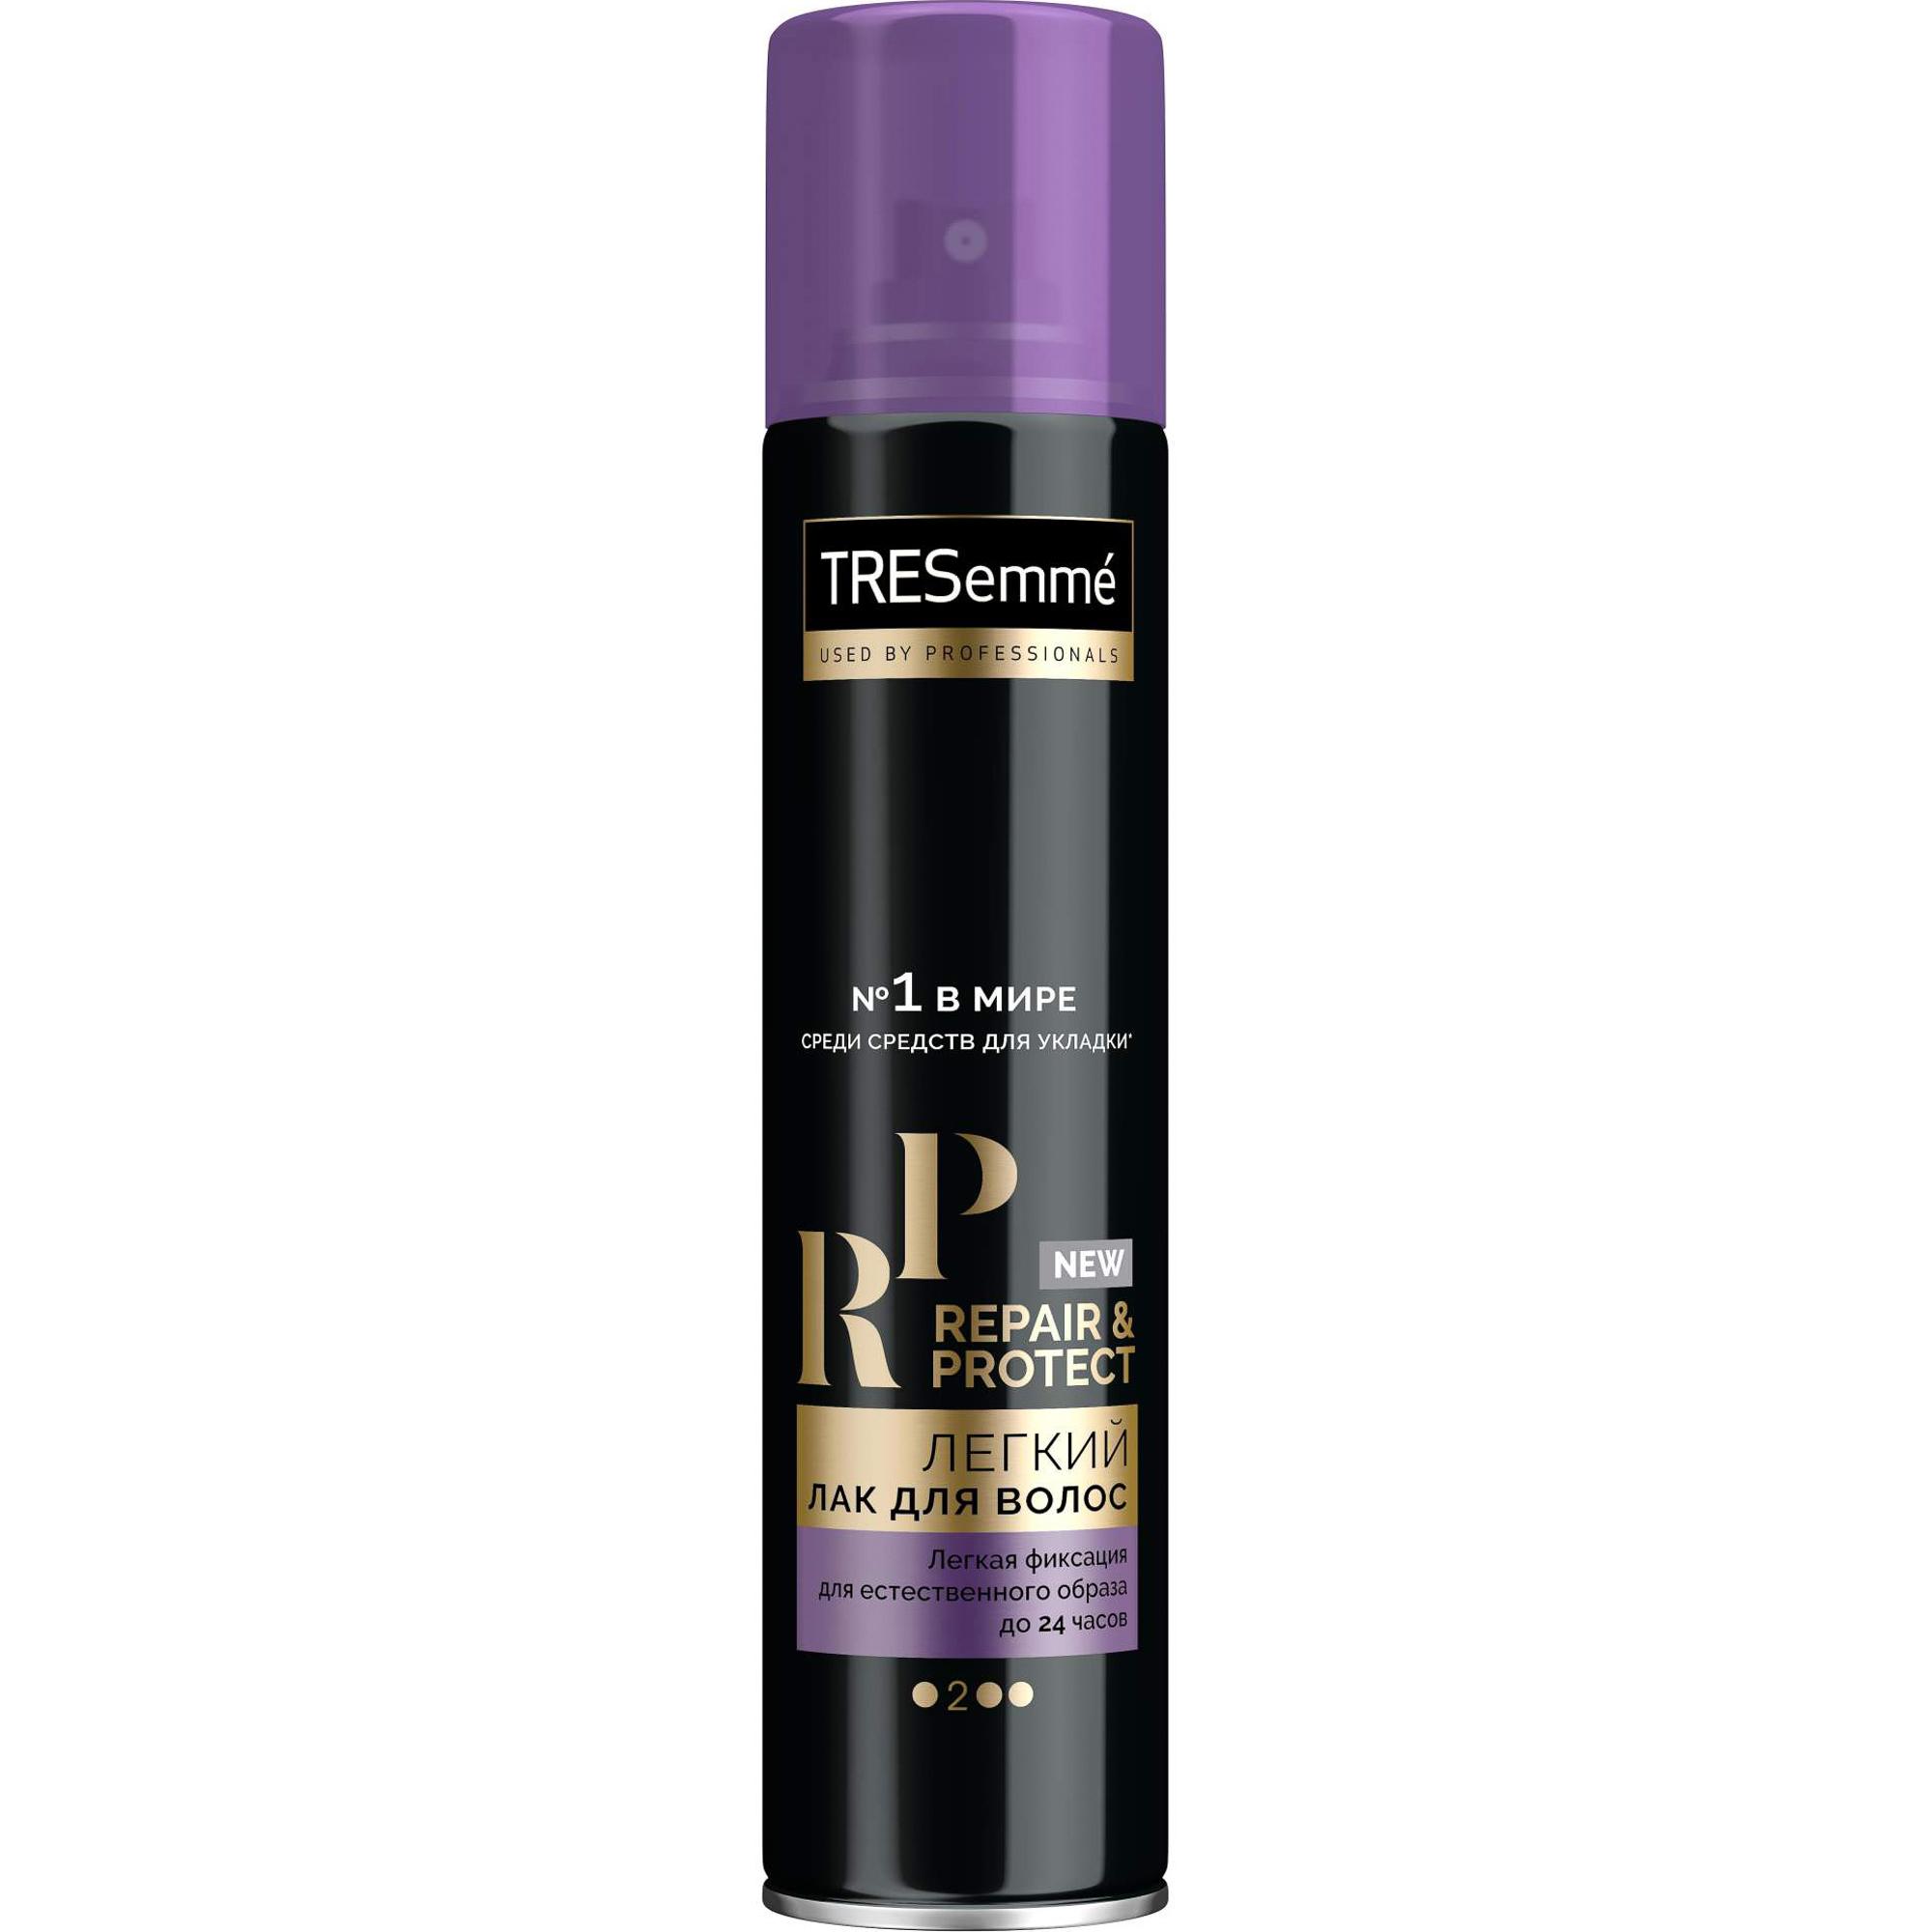 Лак для волос TRESemme Repair and Protect 250 мл.